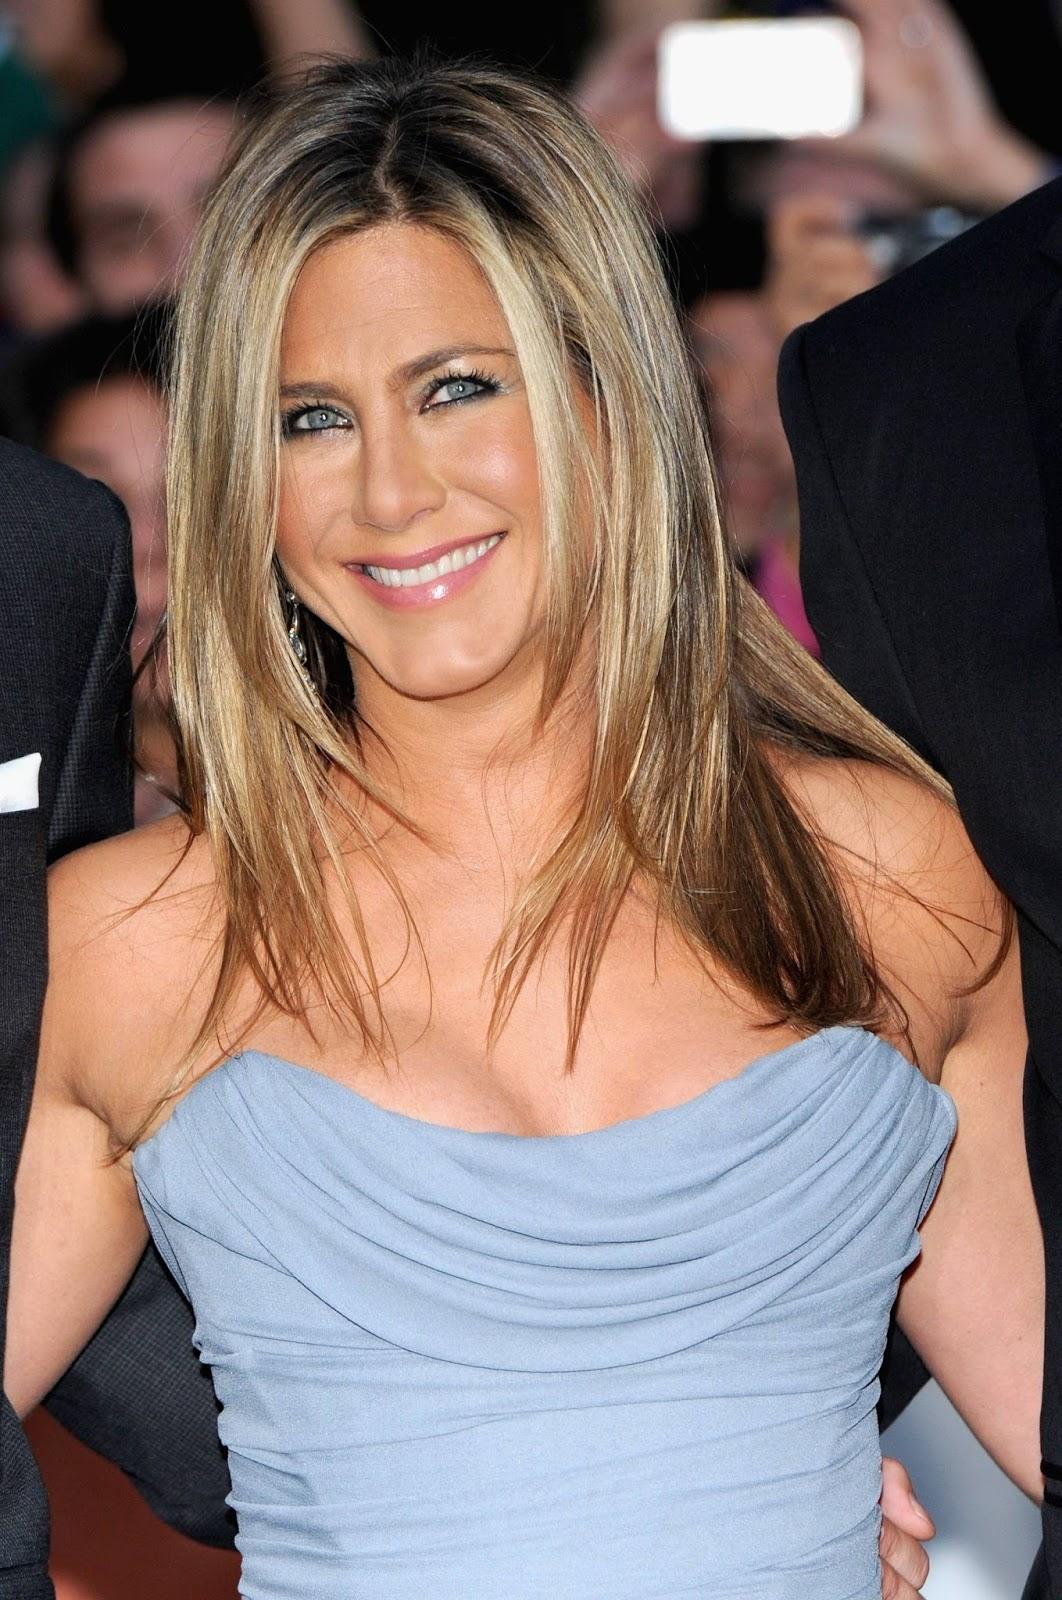 jennifer aniston celebrity actress - photo #32